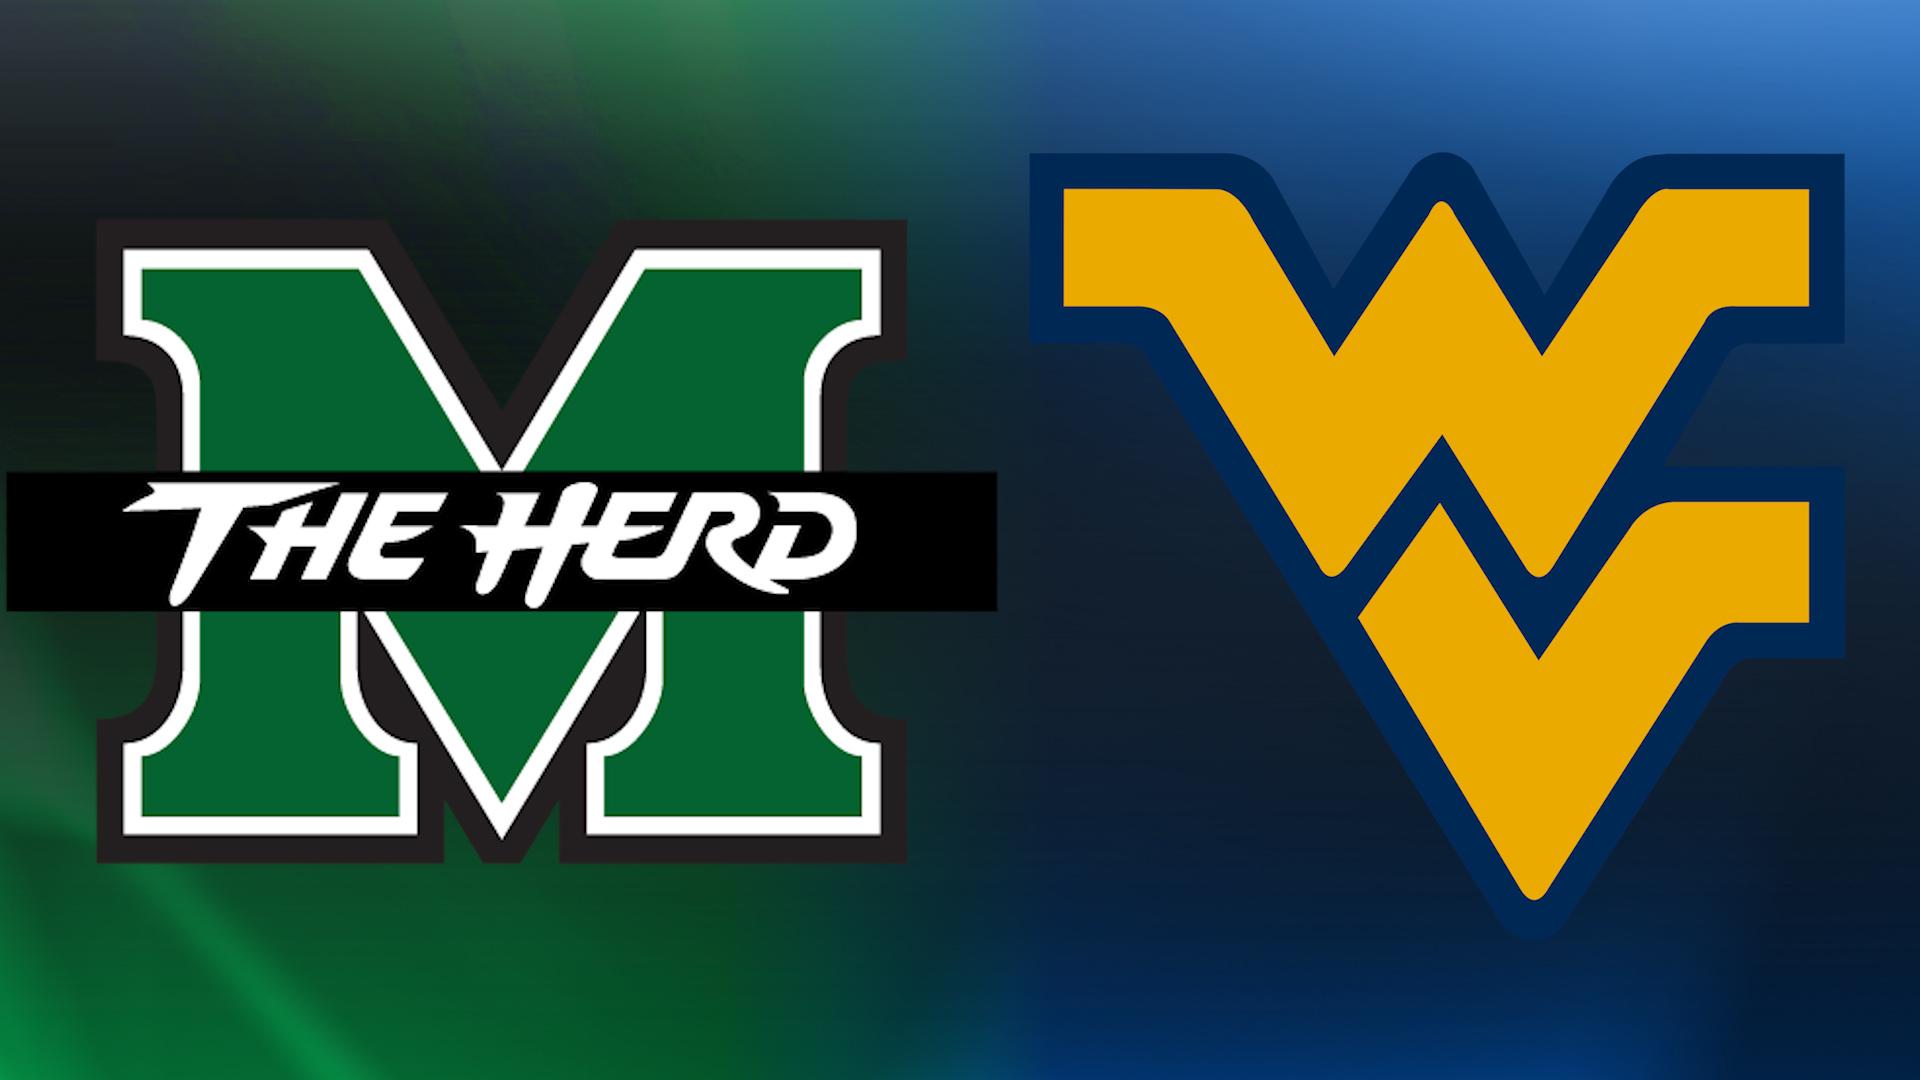 Marshall & WVU Logos.jpg